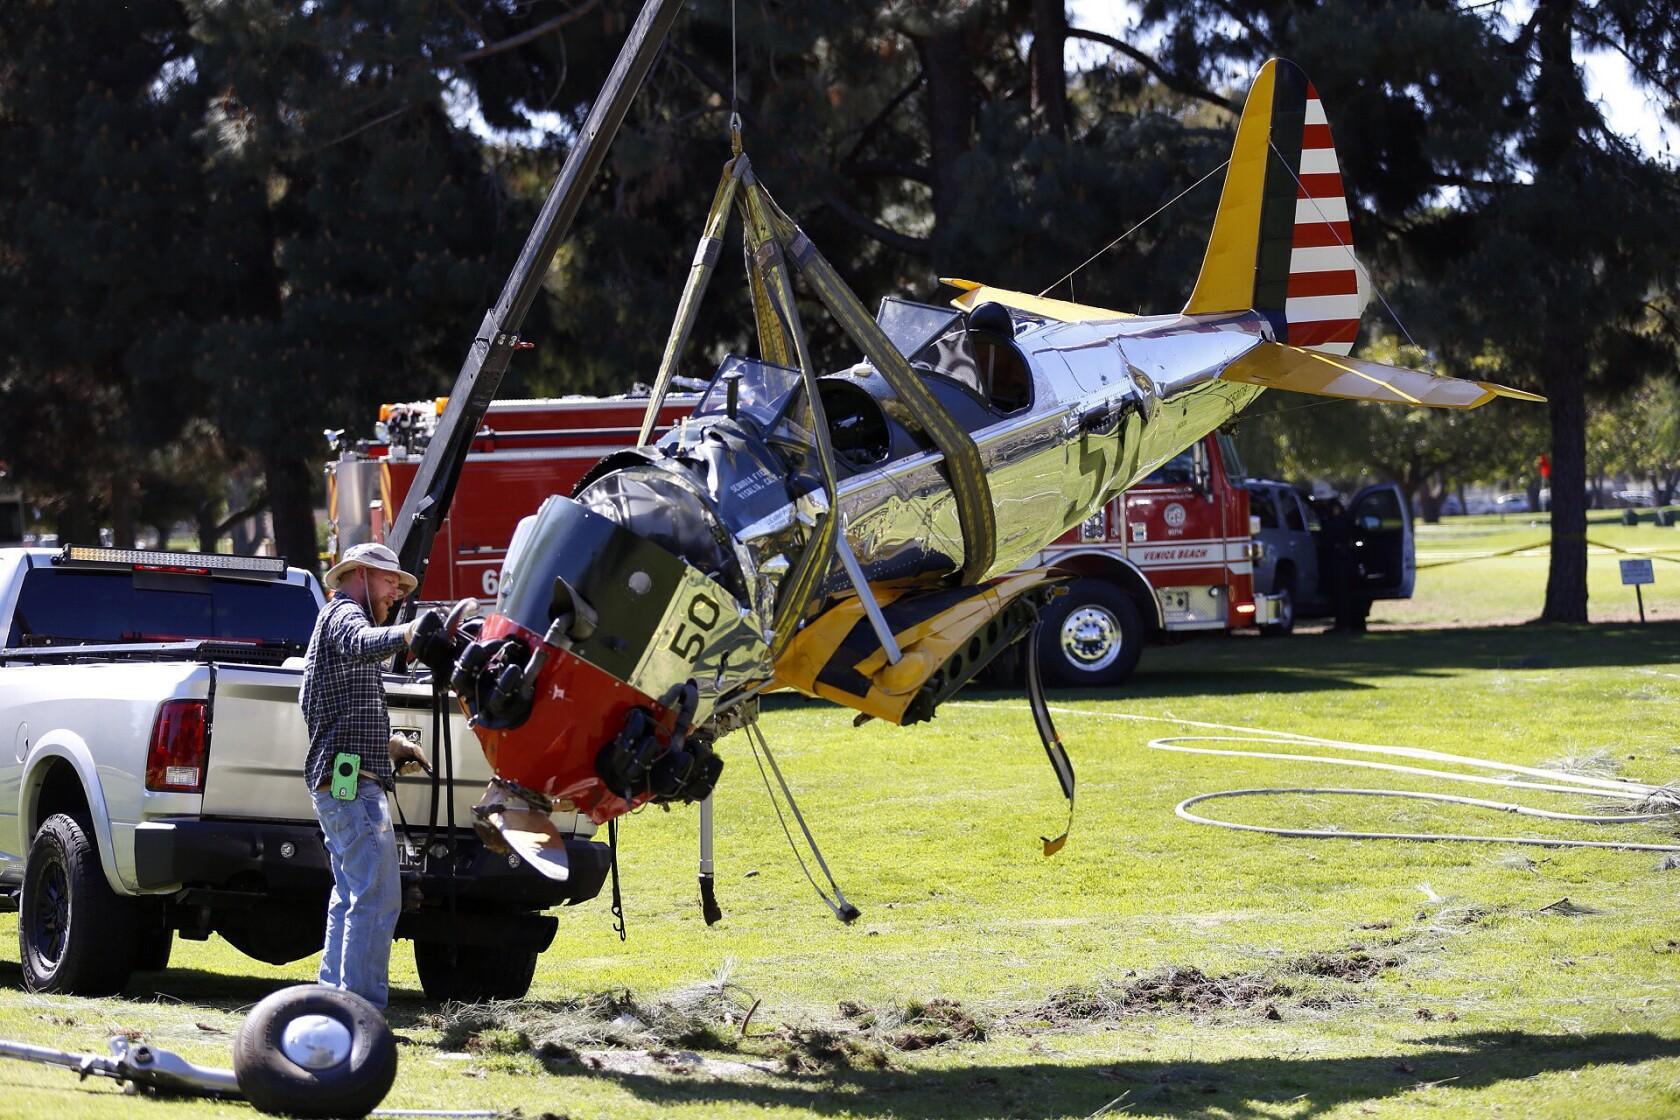 Harrison Ford recovering after crash landing plane on golf